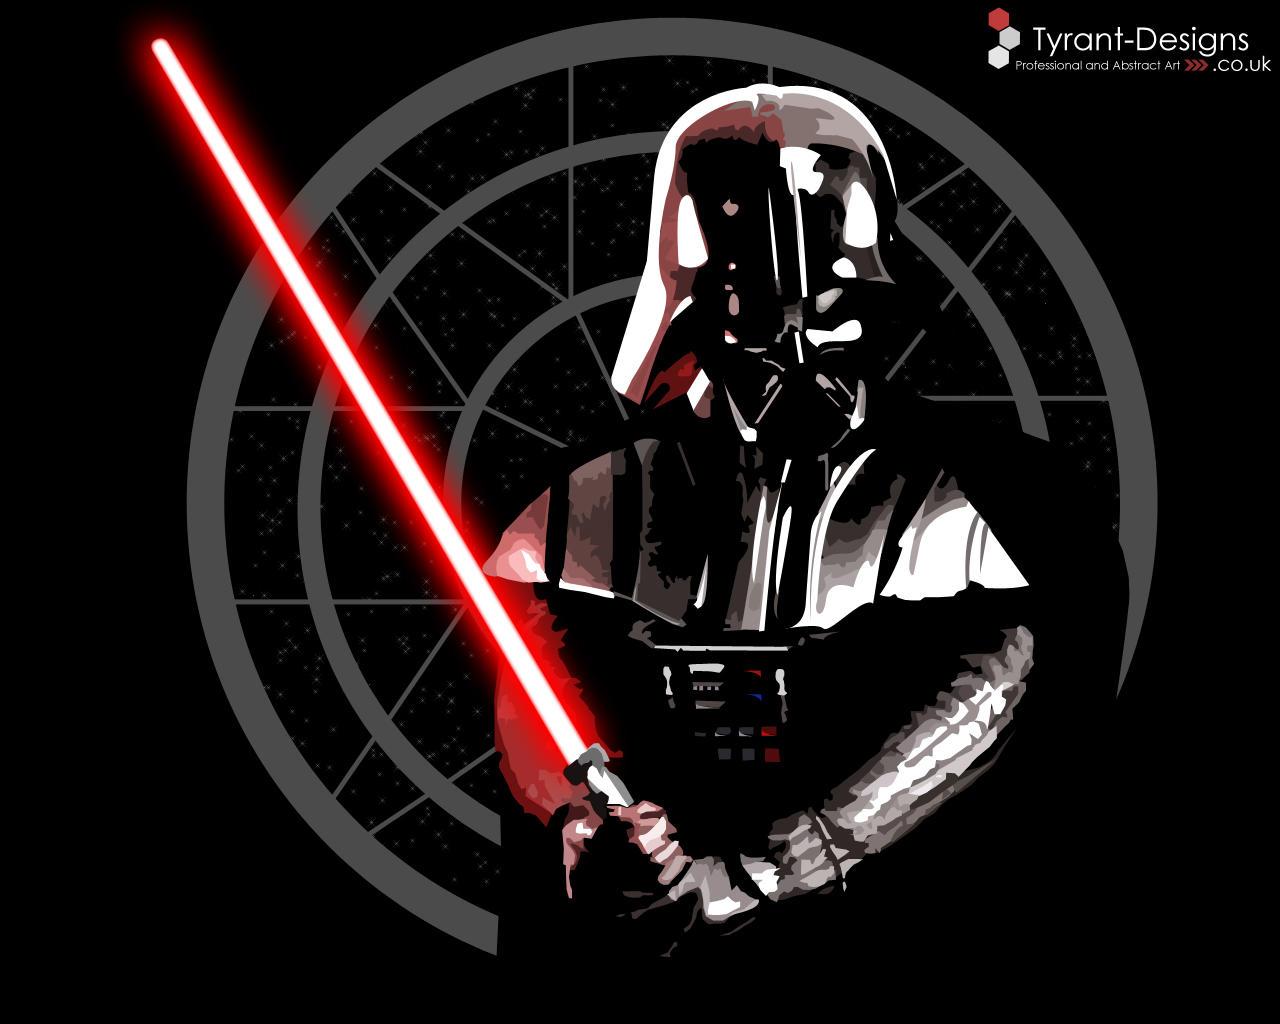 Darth Vader by Tyrant-Designs